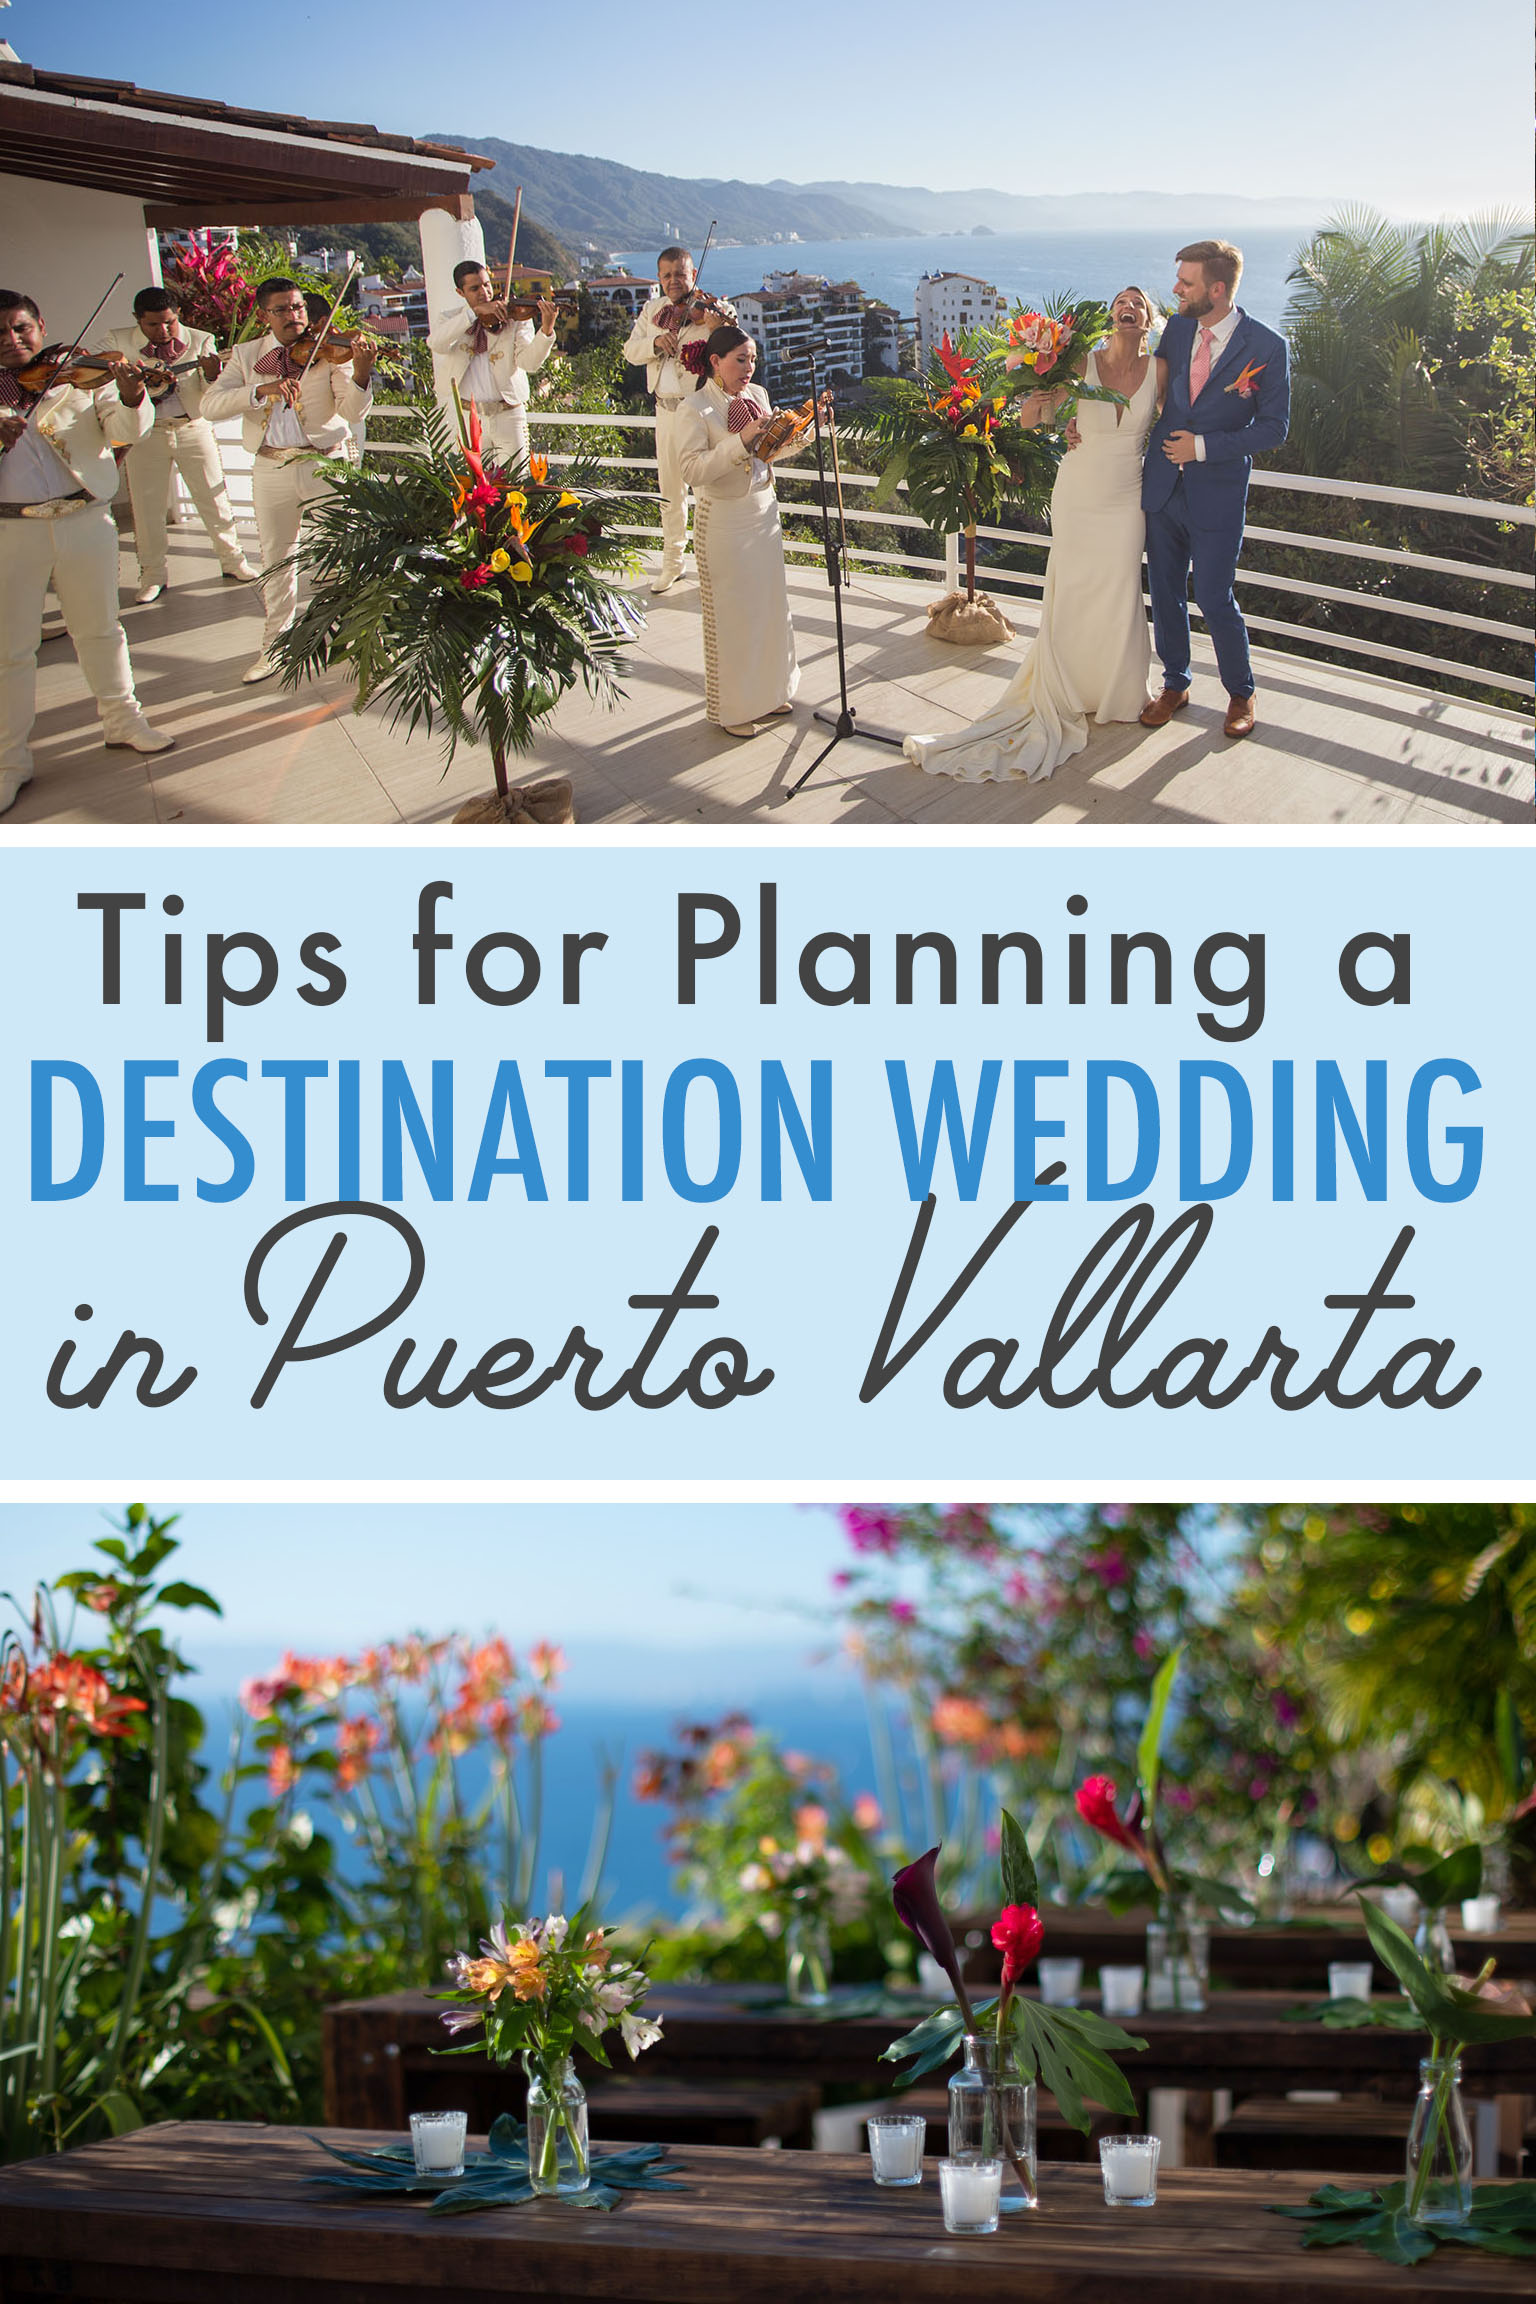 Planning a destination wedding in Puerto Vallarta